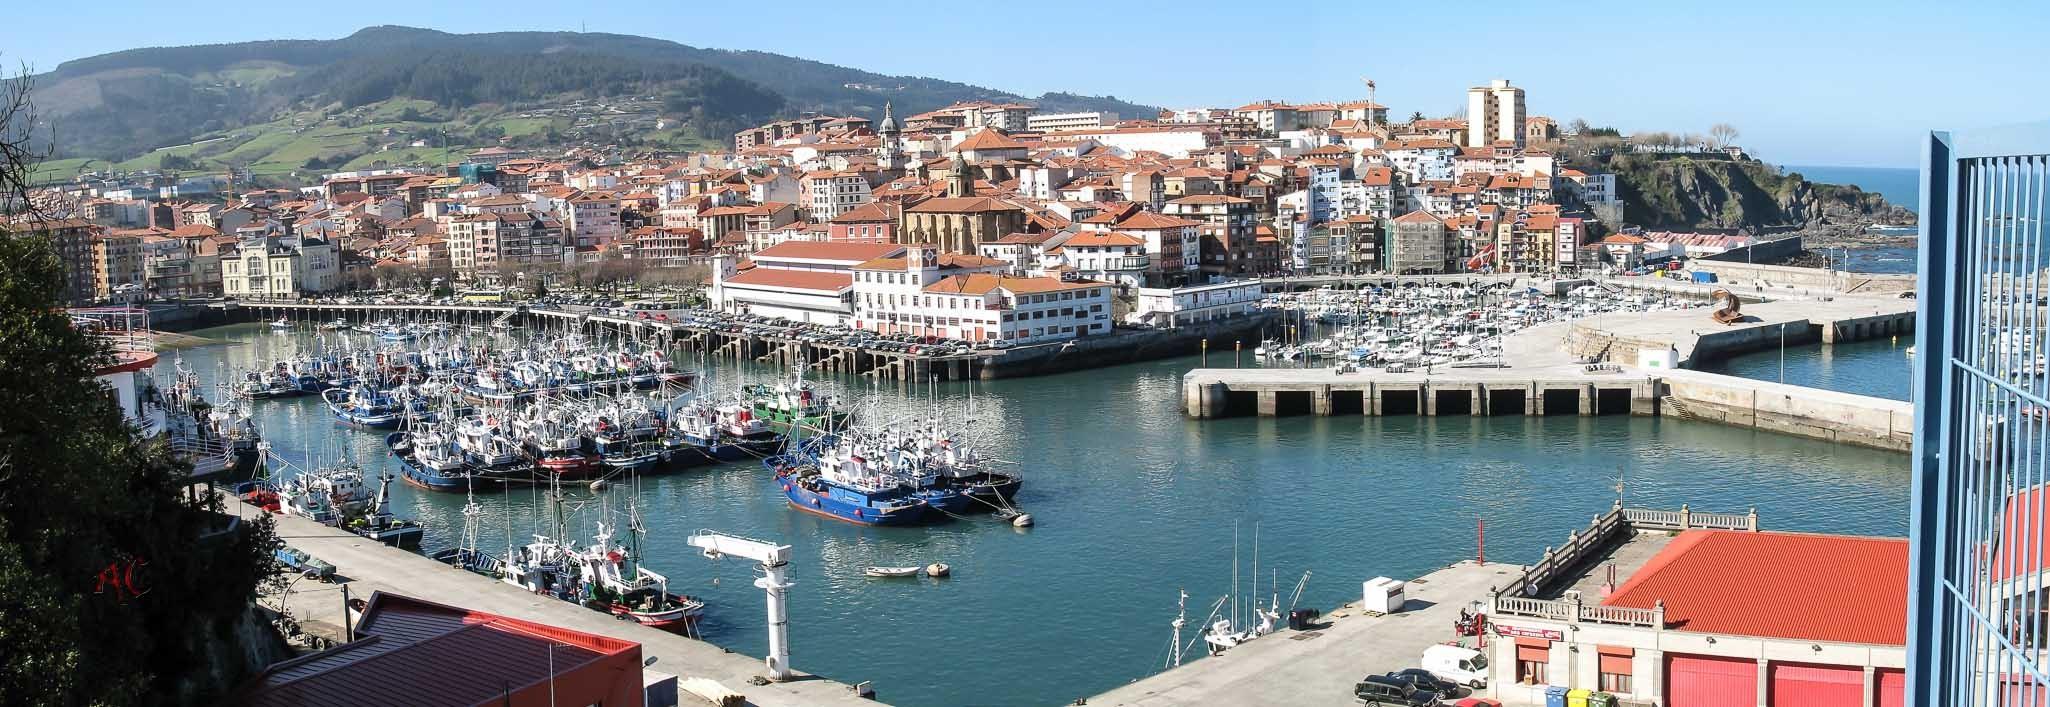 Panoramica del puerto de Bermeo